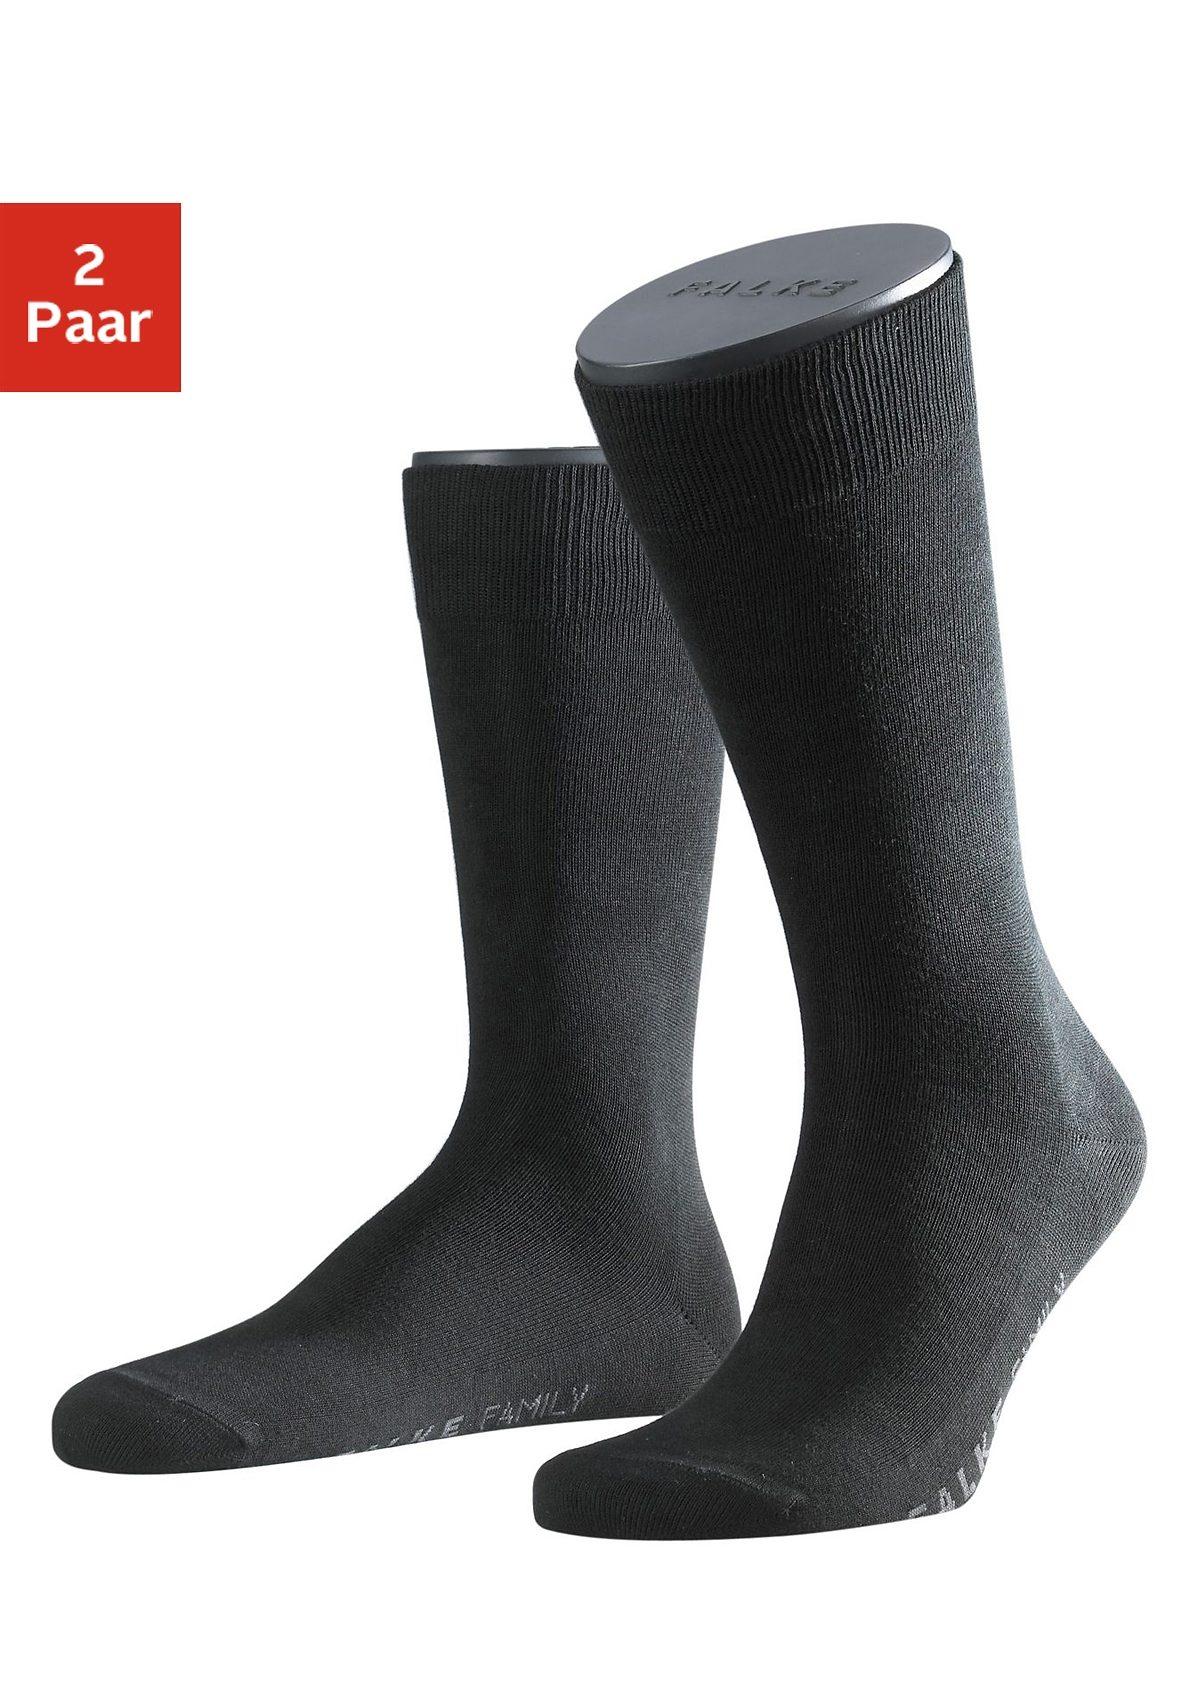 Falke Socken »Family« (2 Paar) mit extrahohem Baumwollanteil